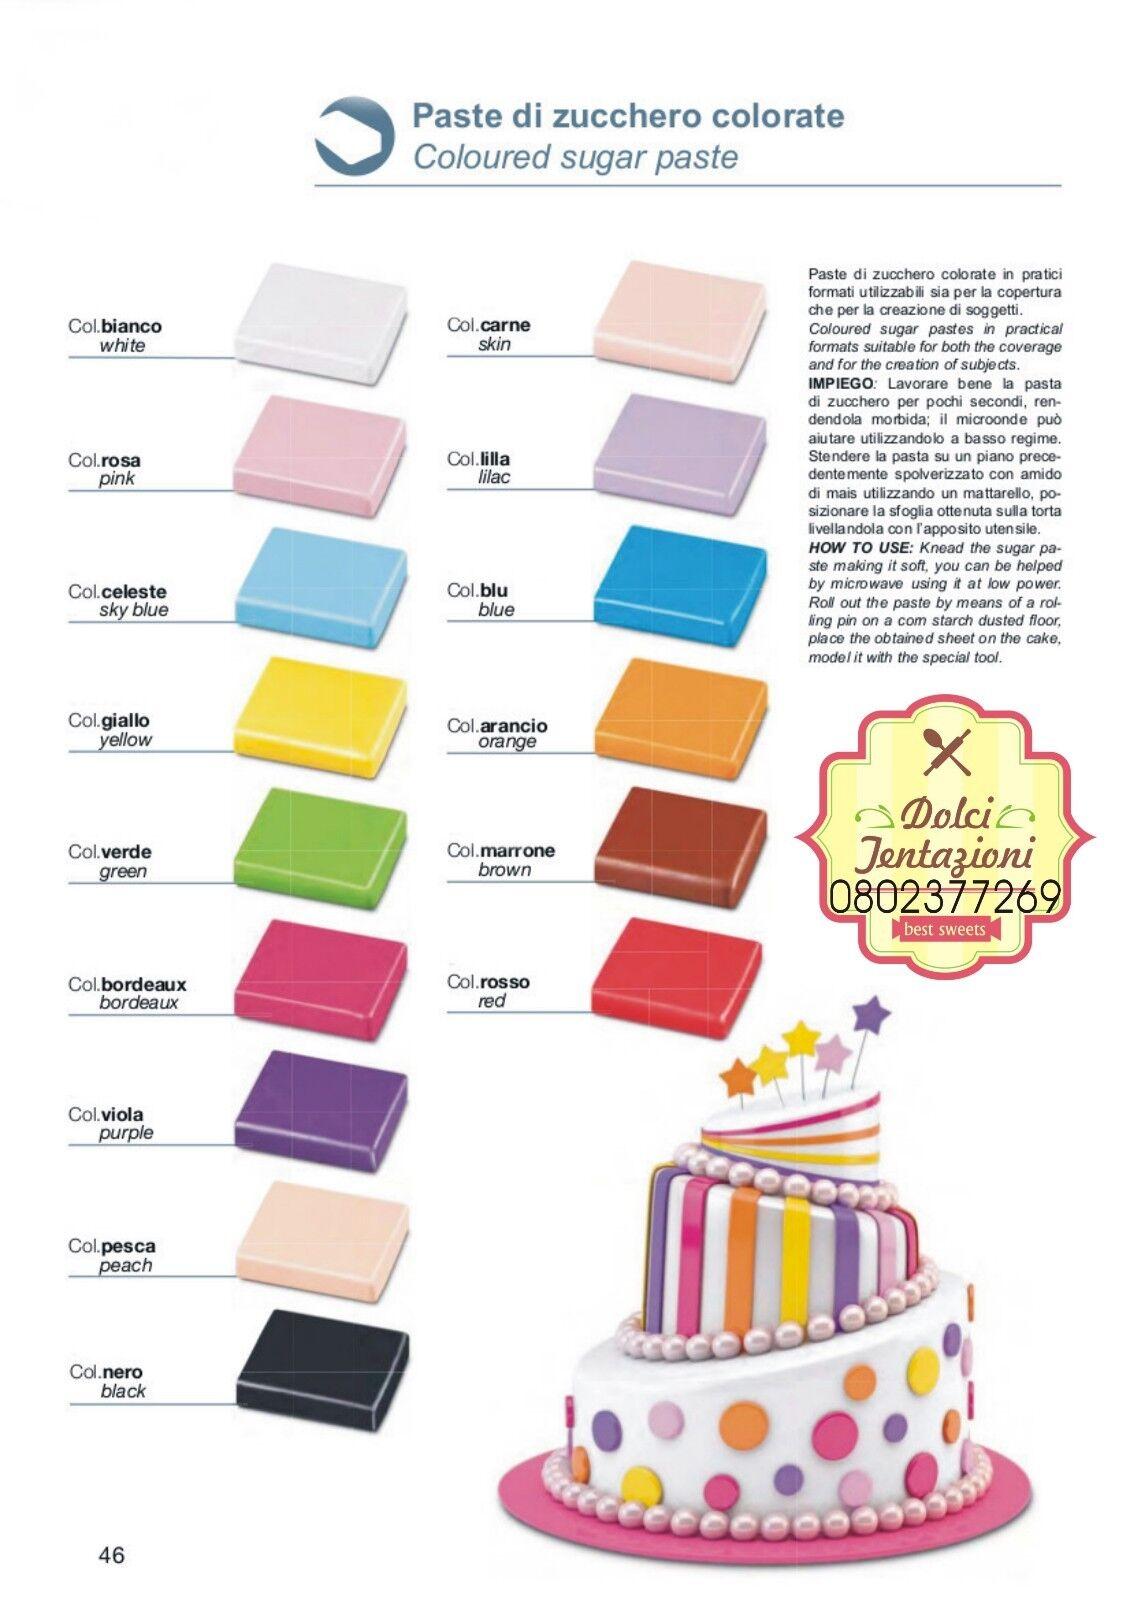 PASTA DI ZUCCHERO COLORATA COPERTURA AMBRA'S DA 1KG GR SENZA GLUTINE CAKE DESIGN